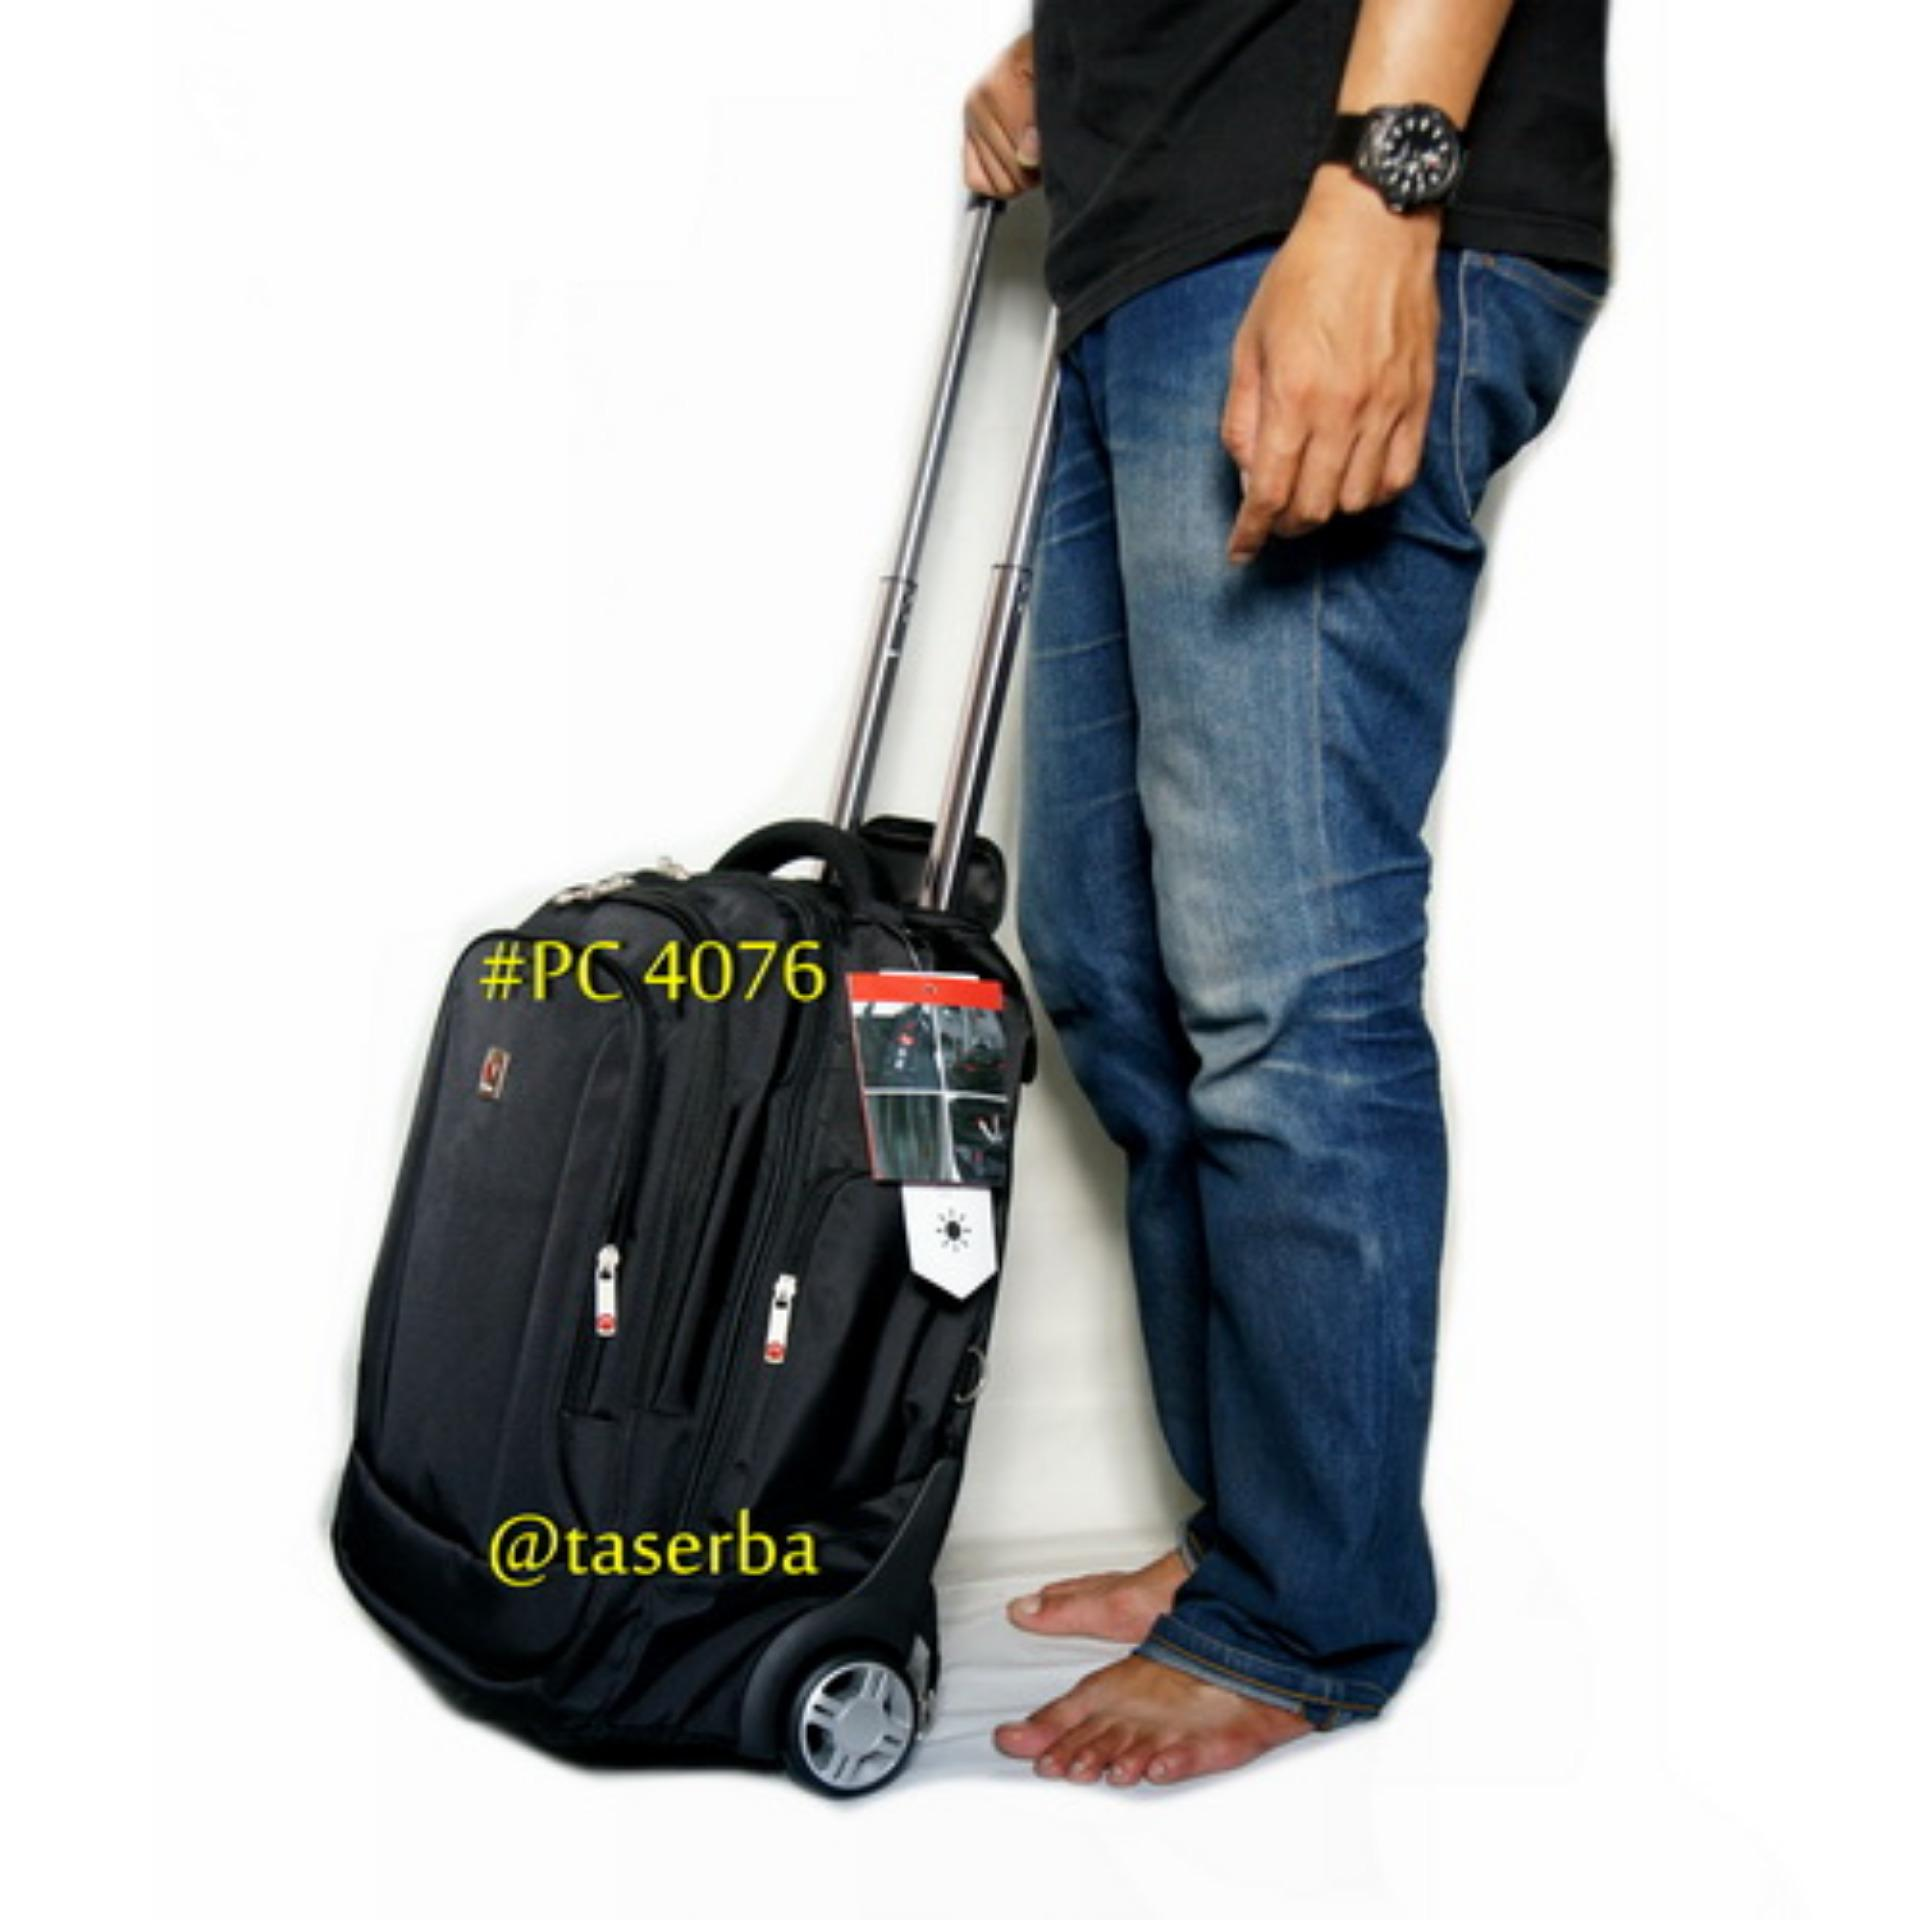 Tas Selempang Pria   Wanita Polo USA Harbour - Black HR01 + FREE Tas Mini  Cano Polo Classic Ransel Laptop ... 872d0f75f3